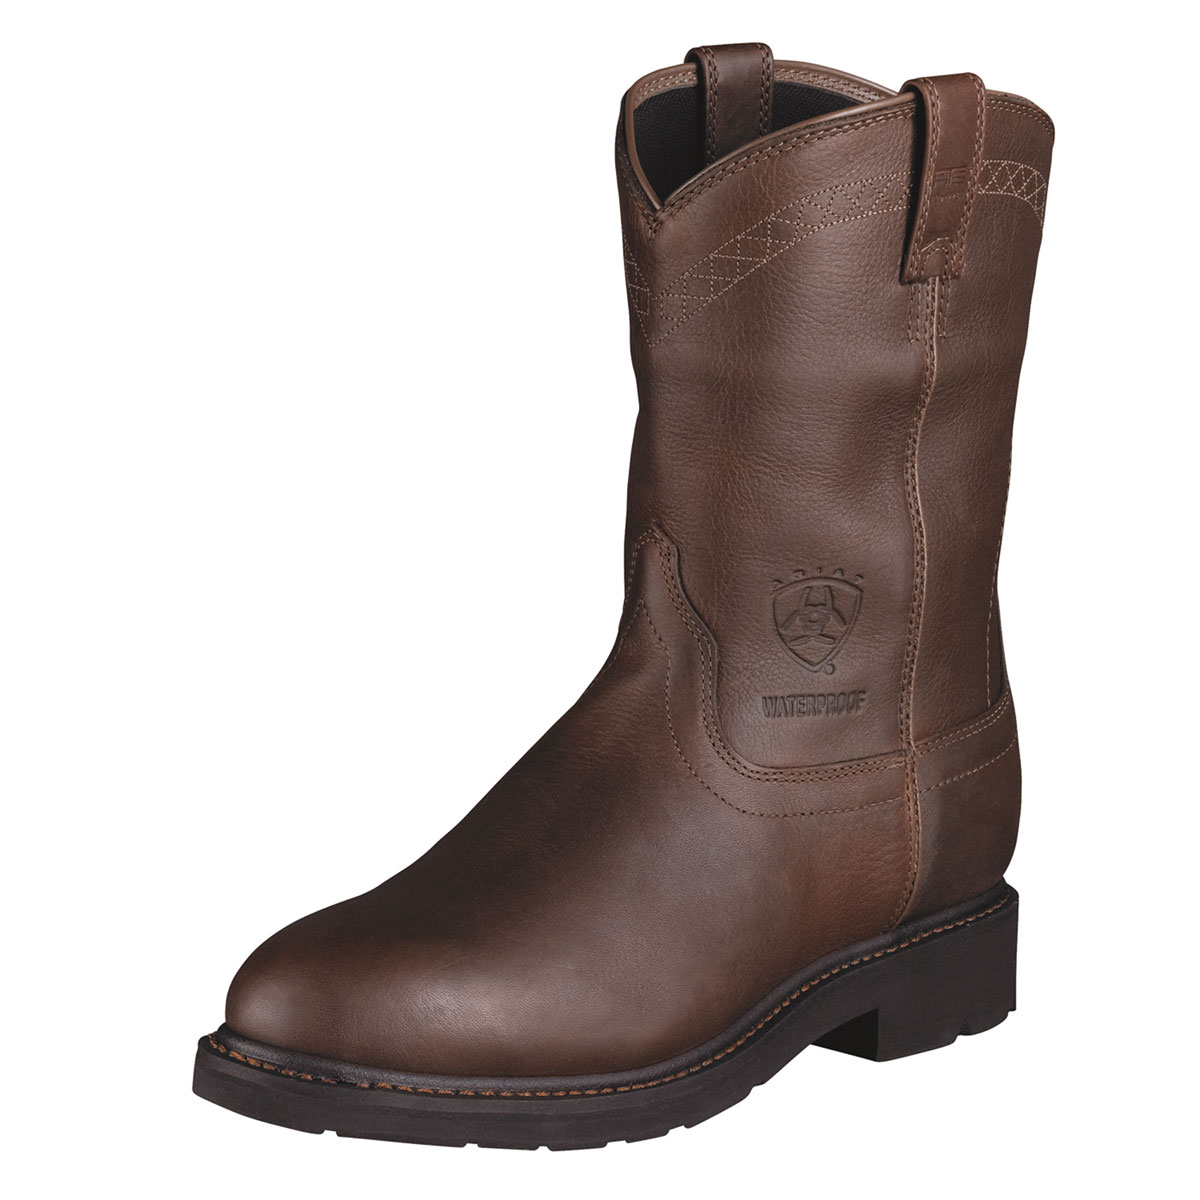 Ariat® Men's Sierra H20 Boots- Closeout!